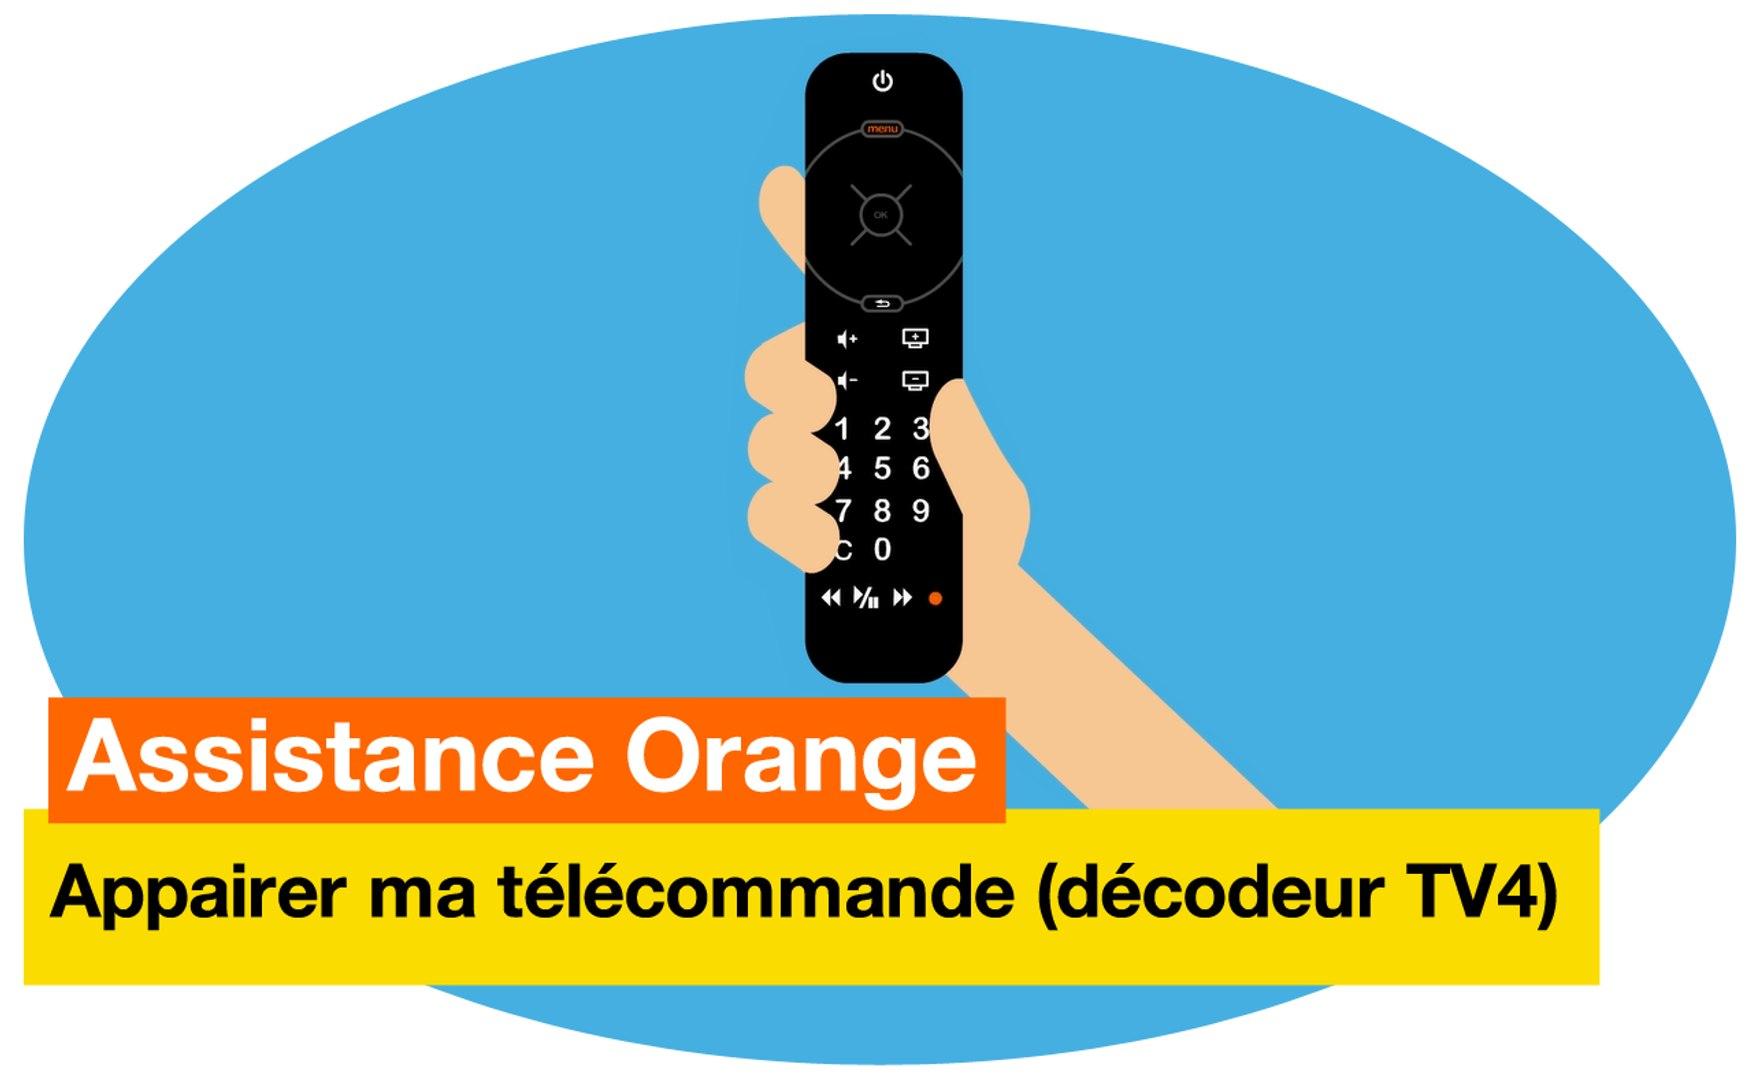 assistance orange j appaire ma telecommande decodeur tv4 orange